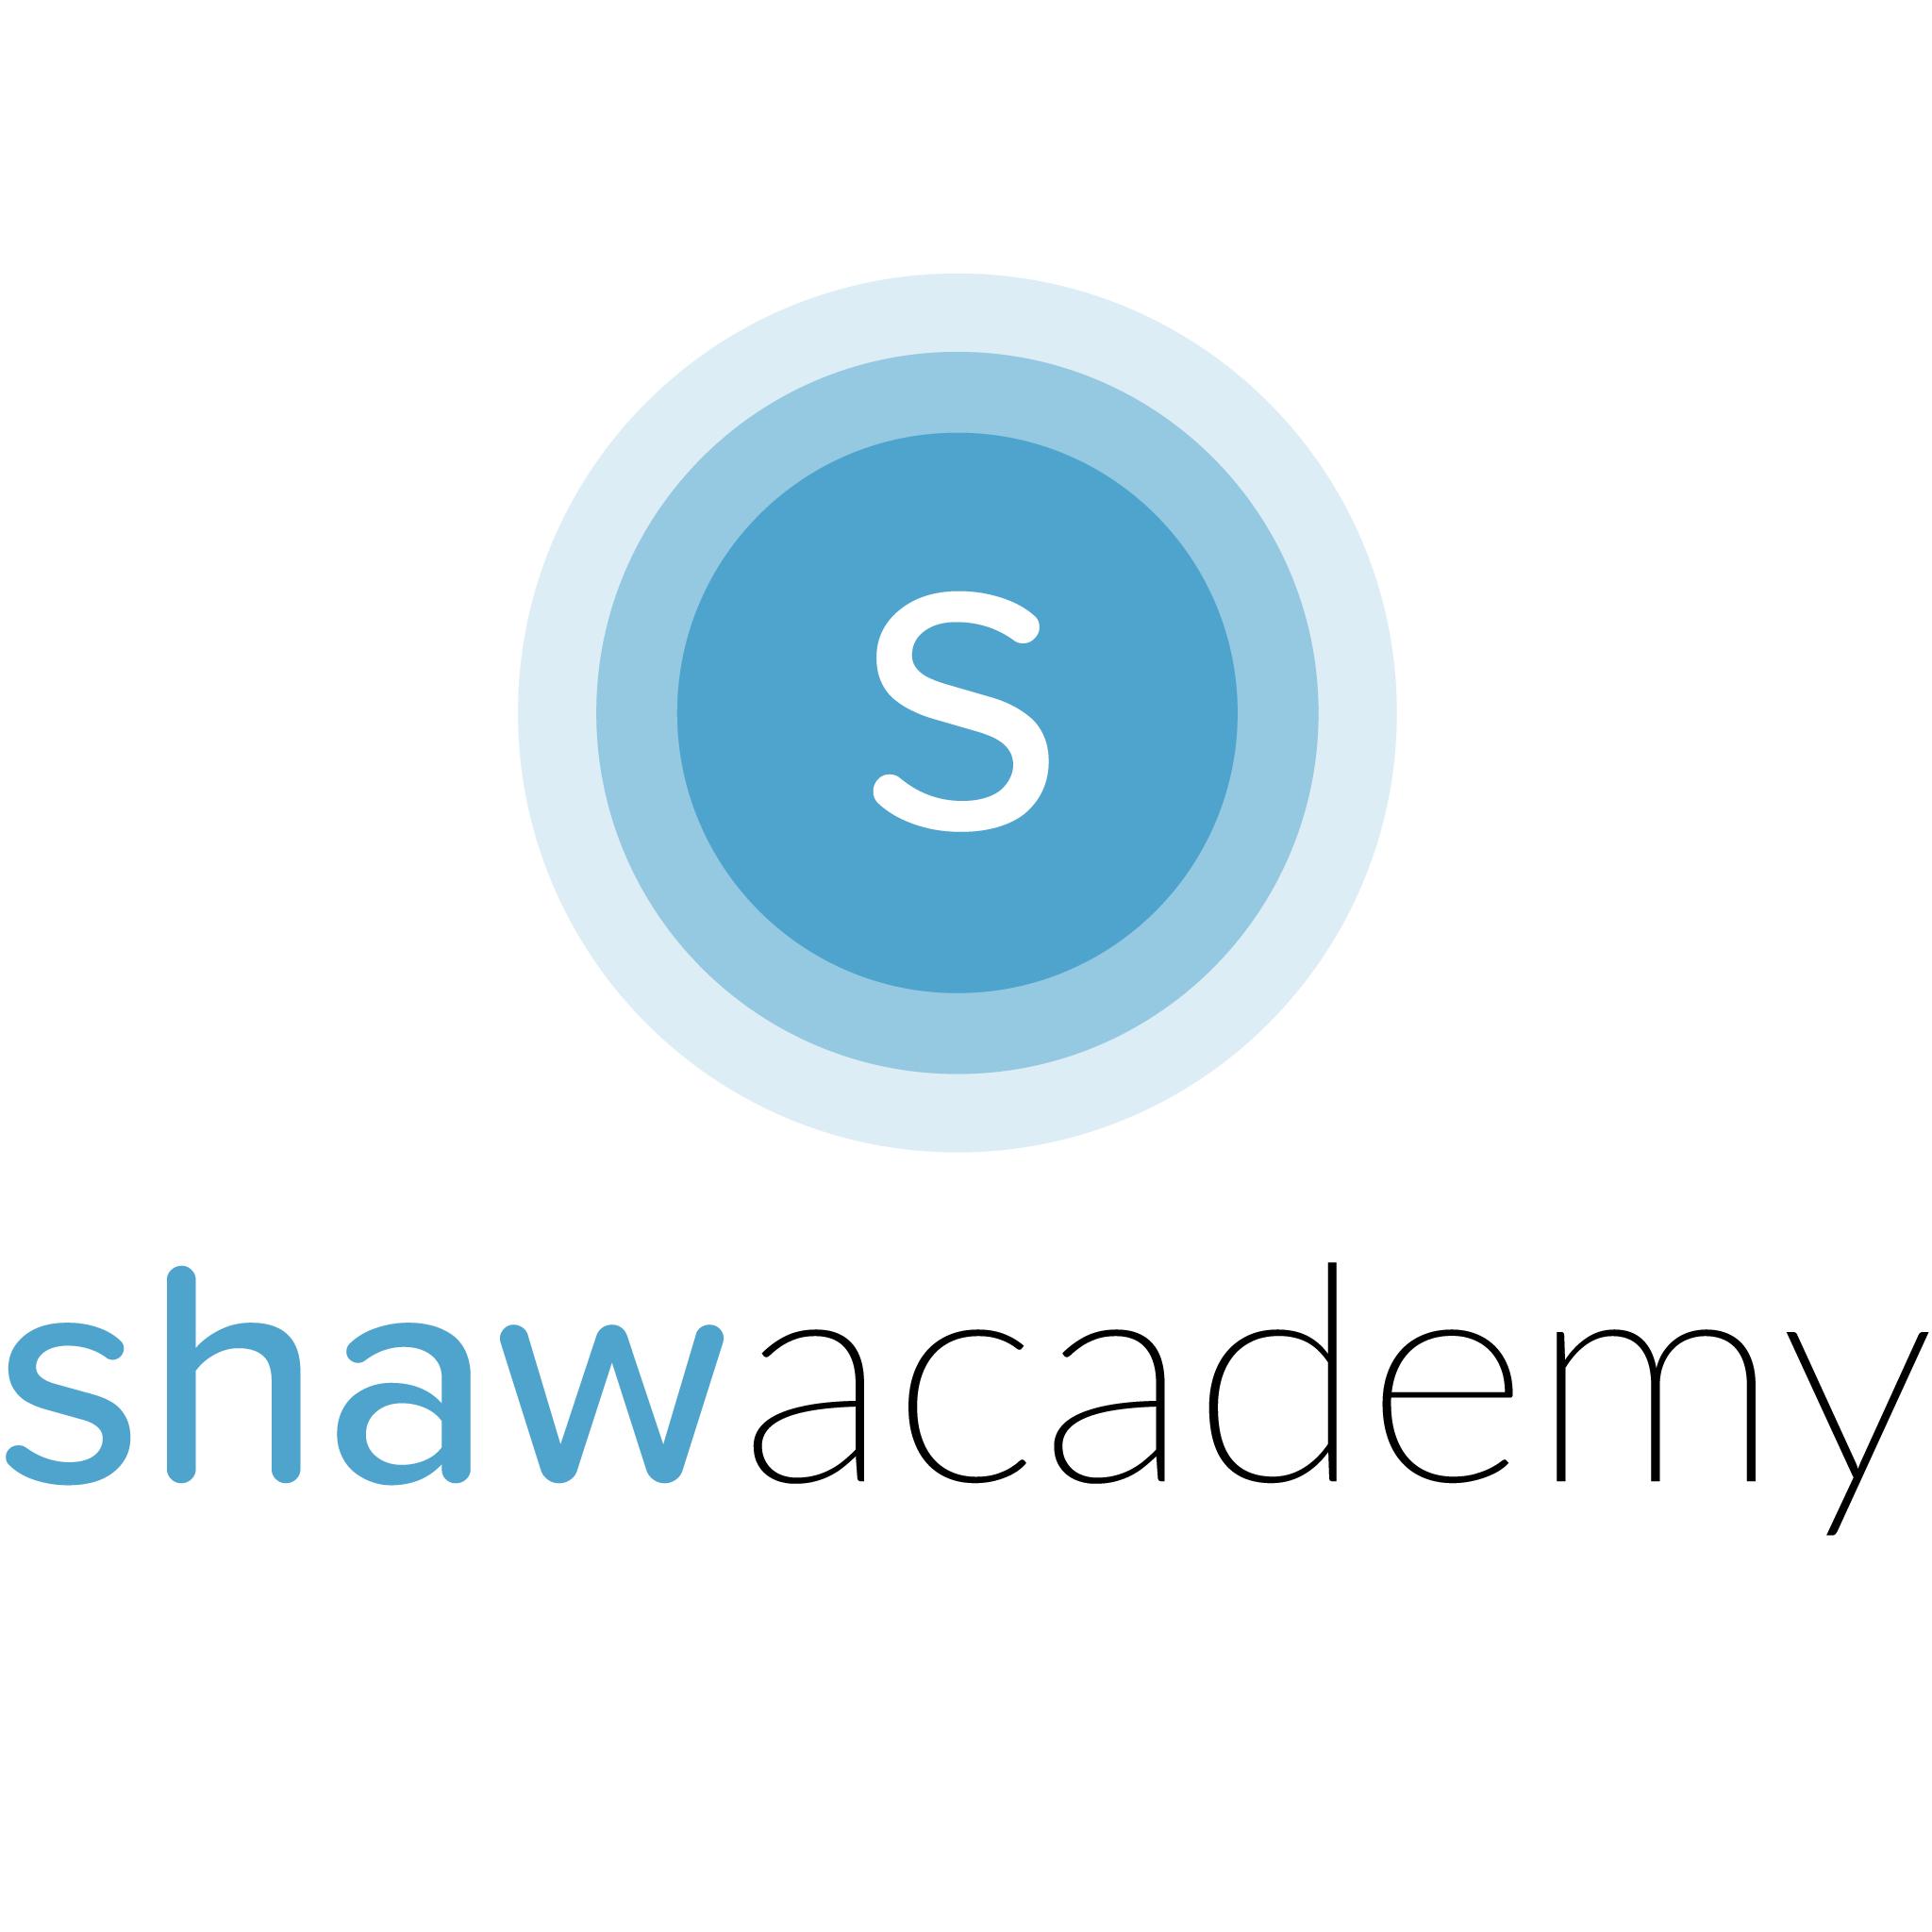 Curso de 1 mes GRATIS a elegir entre muchas temáticas en Shaw Academy [en inglés]